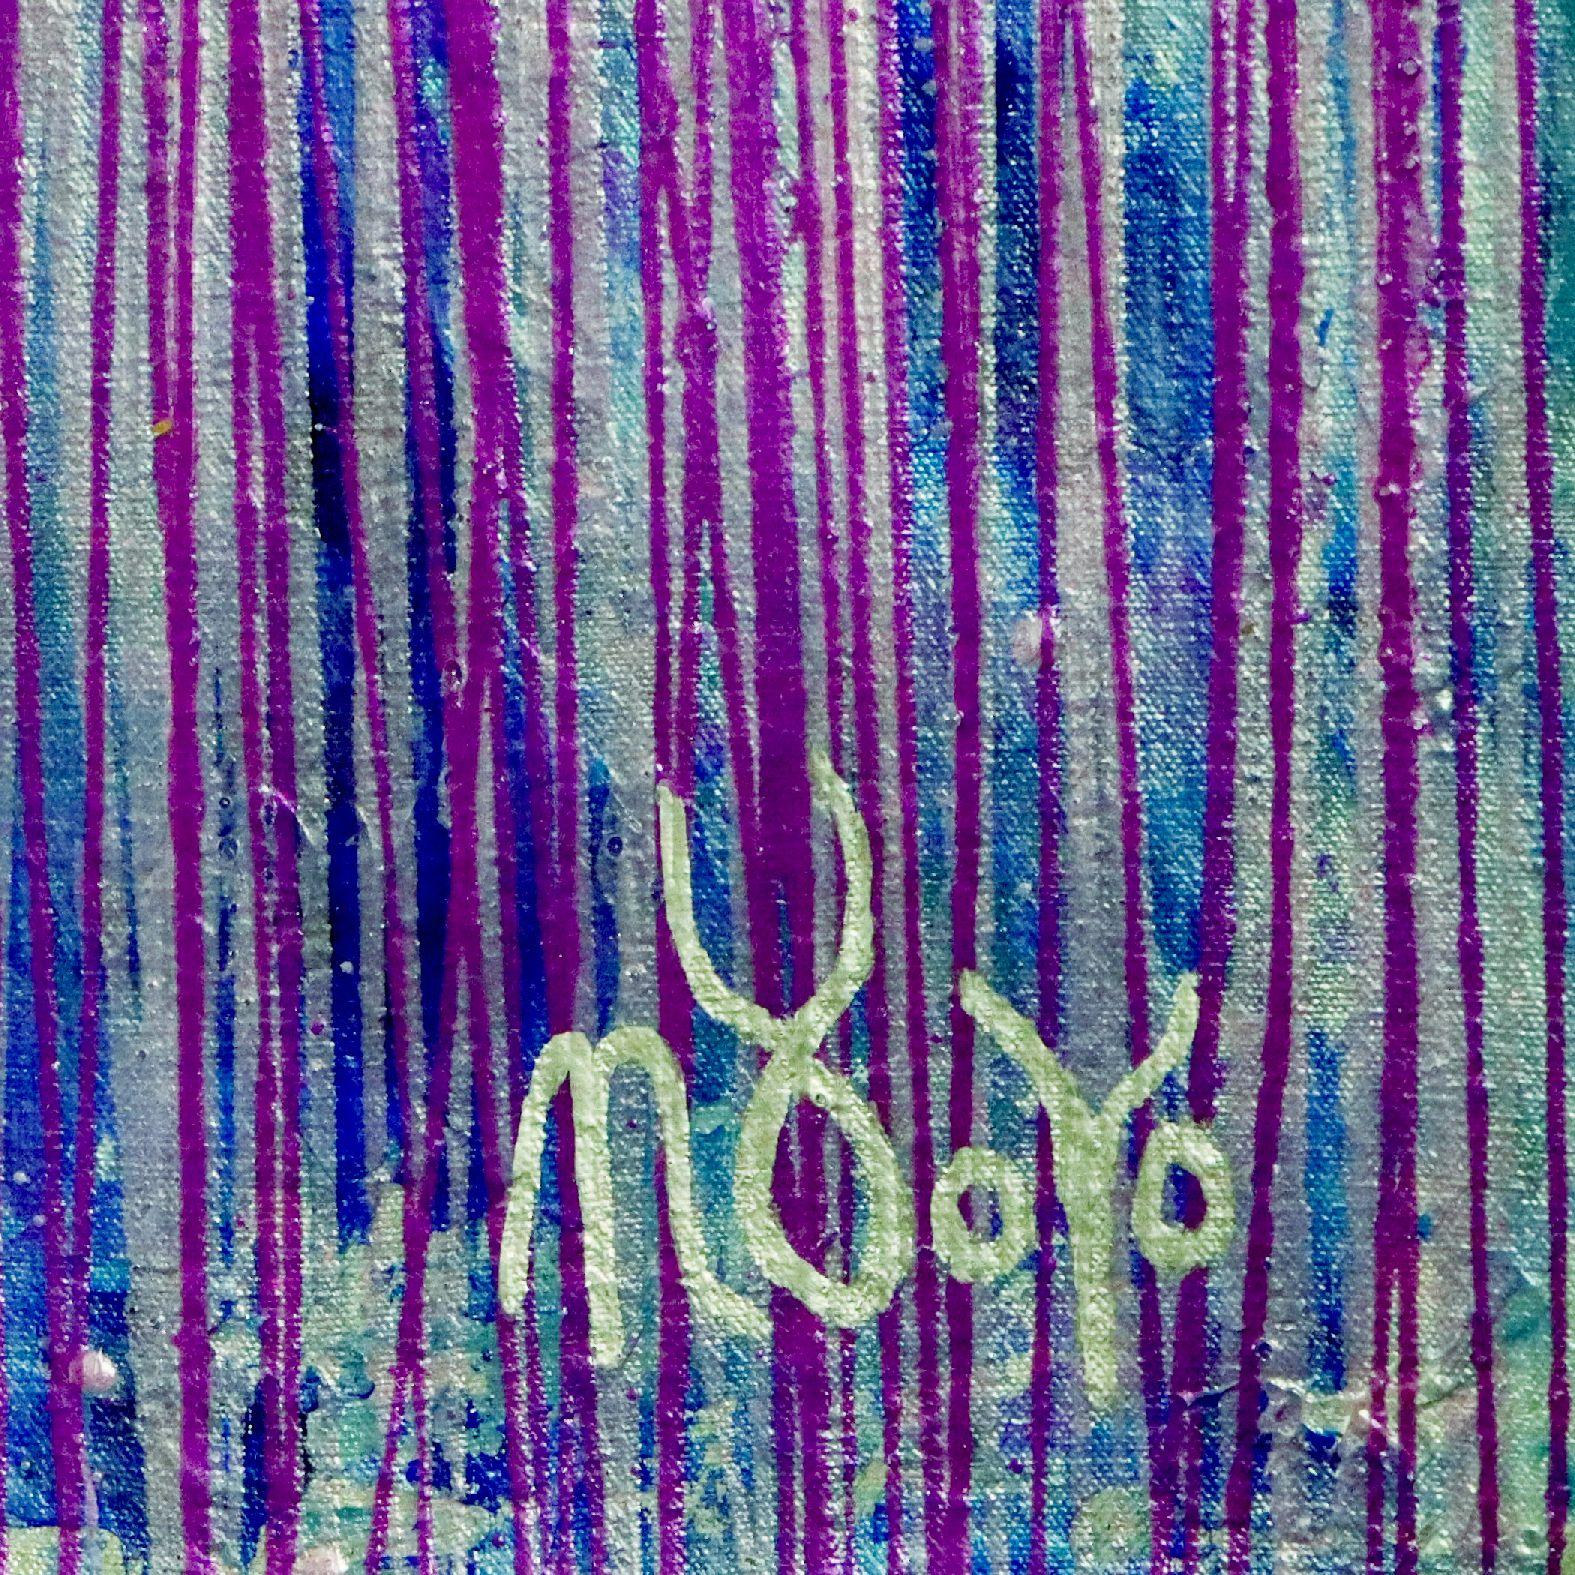 Signatrue - Room View - Purple Spectra (Silver skies) (2020) by Nestor Toro